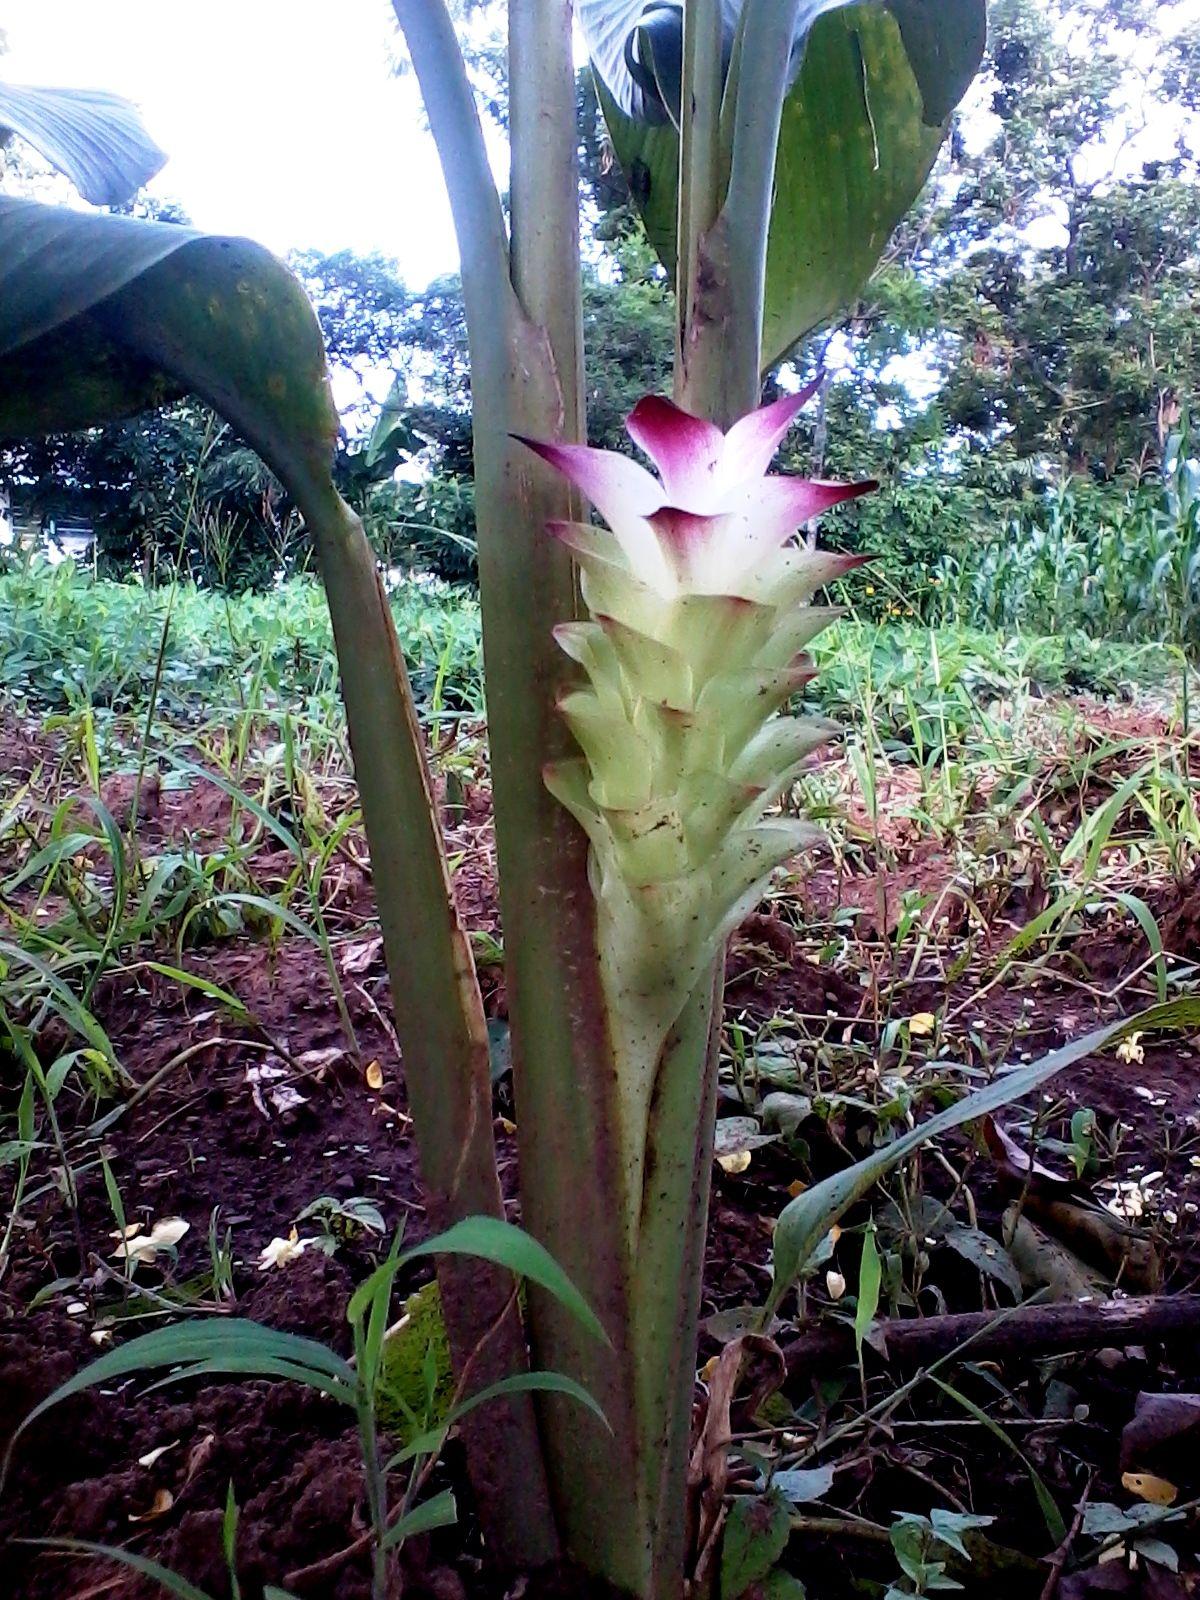 Turmeric Flower Turmeric Is From A Perennial Shrub Originating In